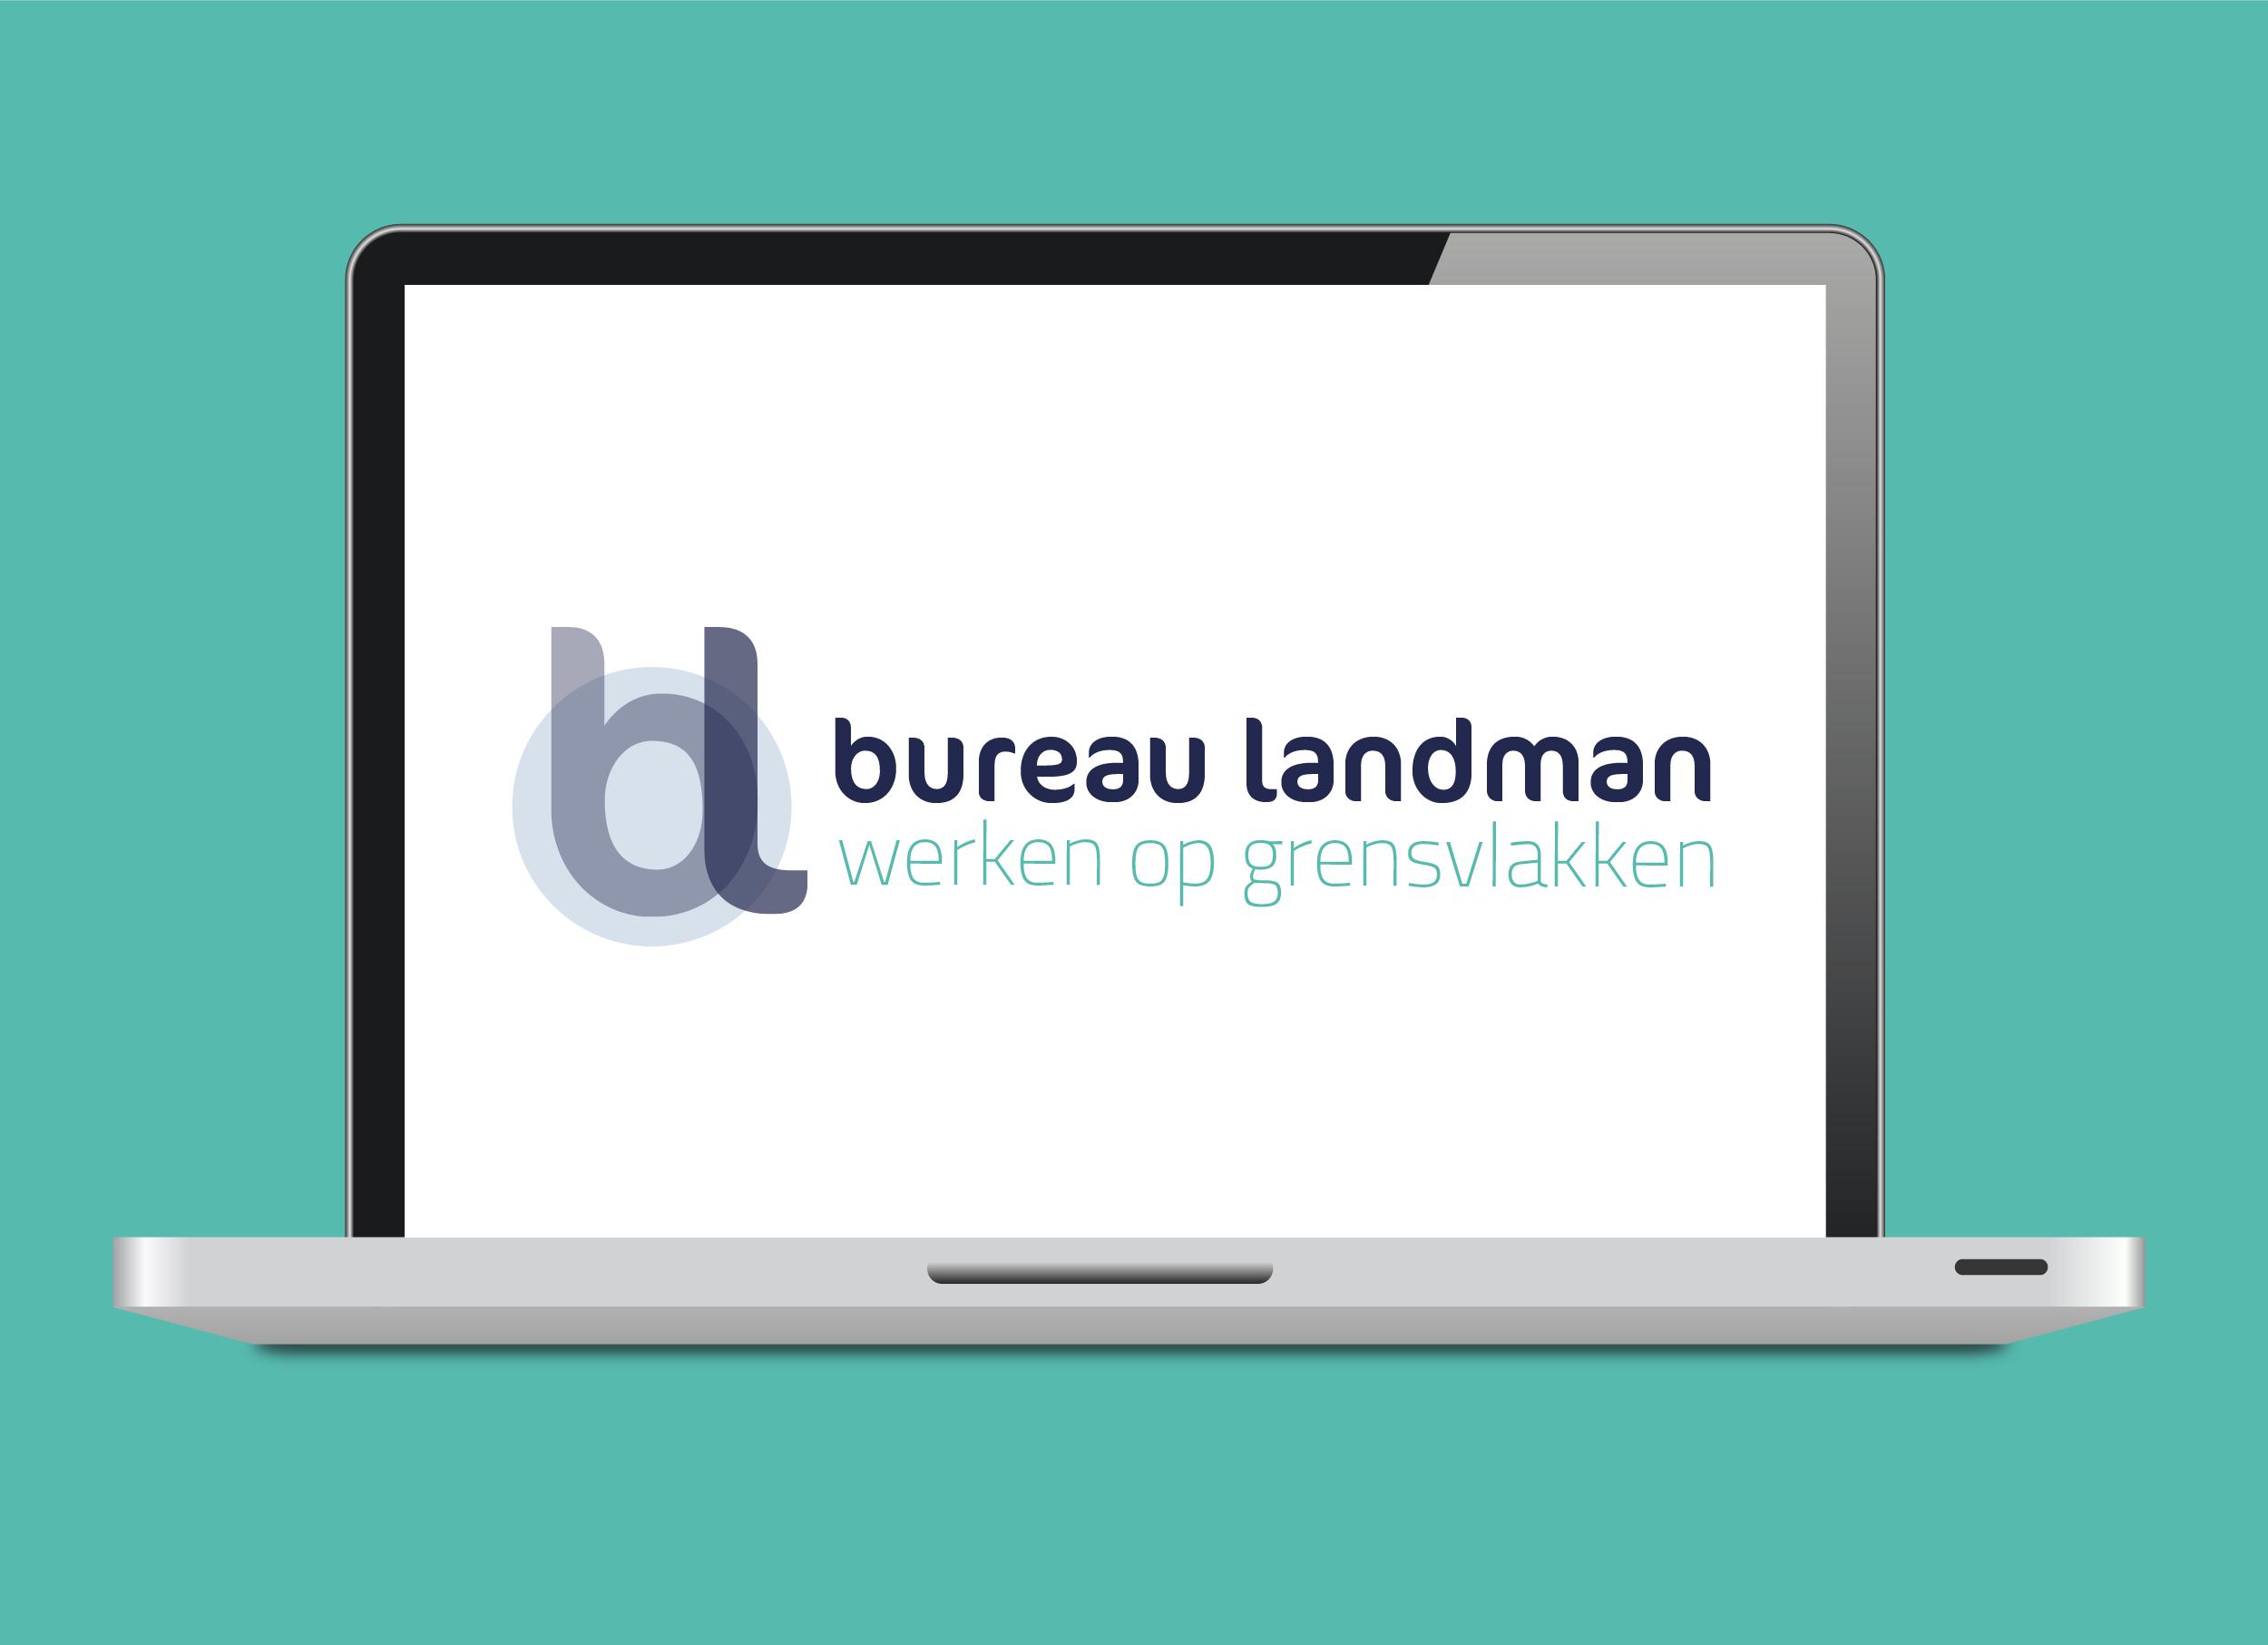 bureaulandman-01